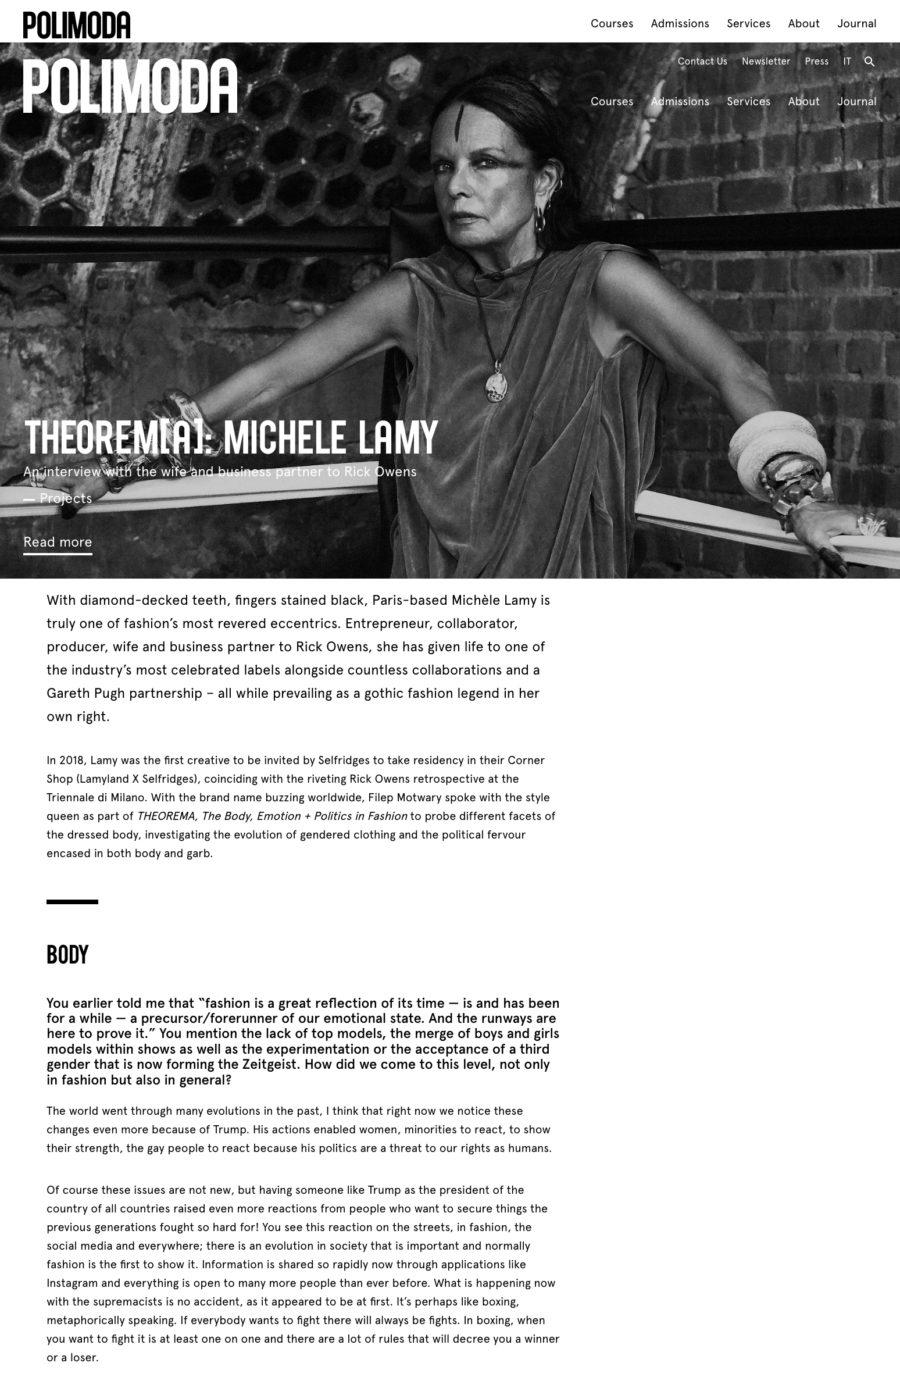 michelle lamy filep motwary book theorema